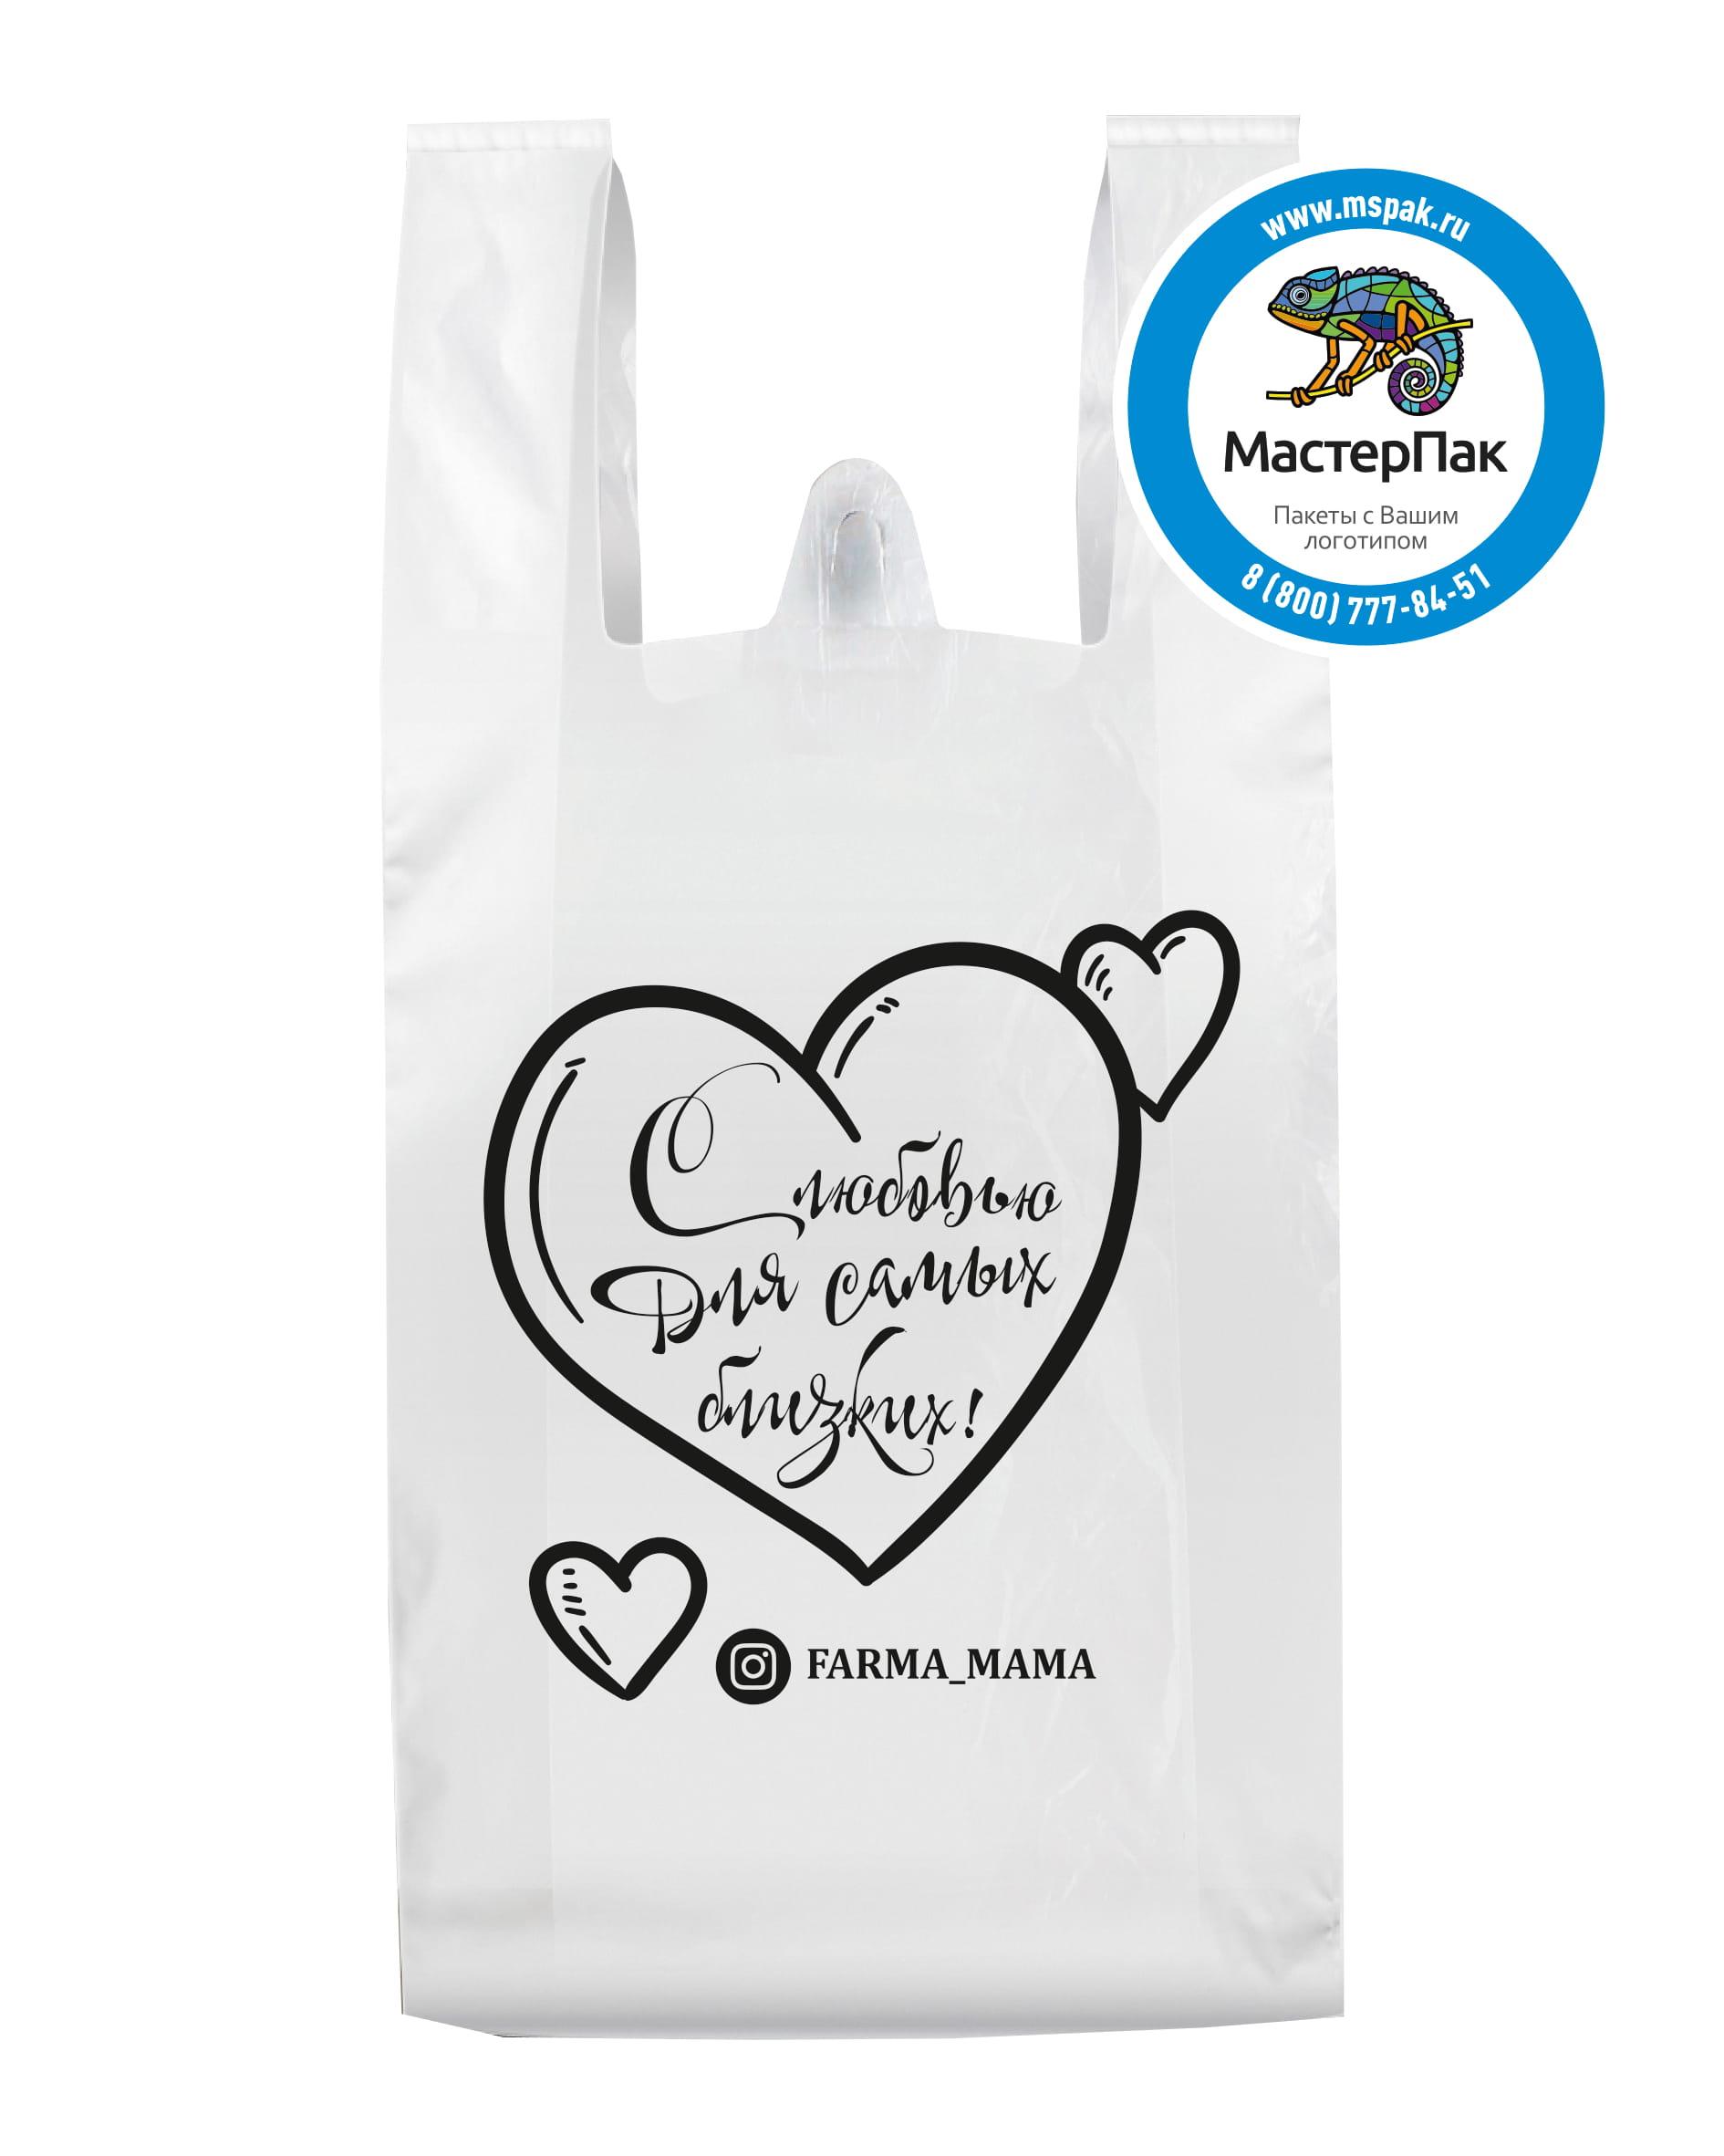 Пакет-майка ПНД, белый, с логотипом Farma Mama, 23 мкм, 40*60 , Архангельск